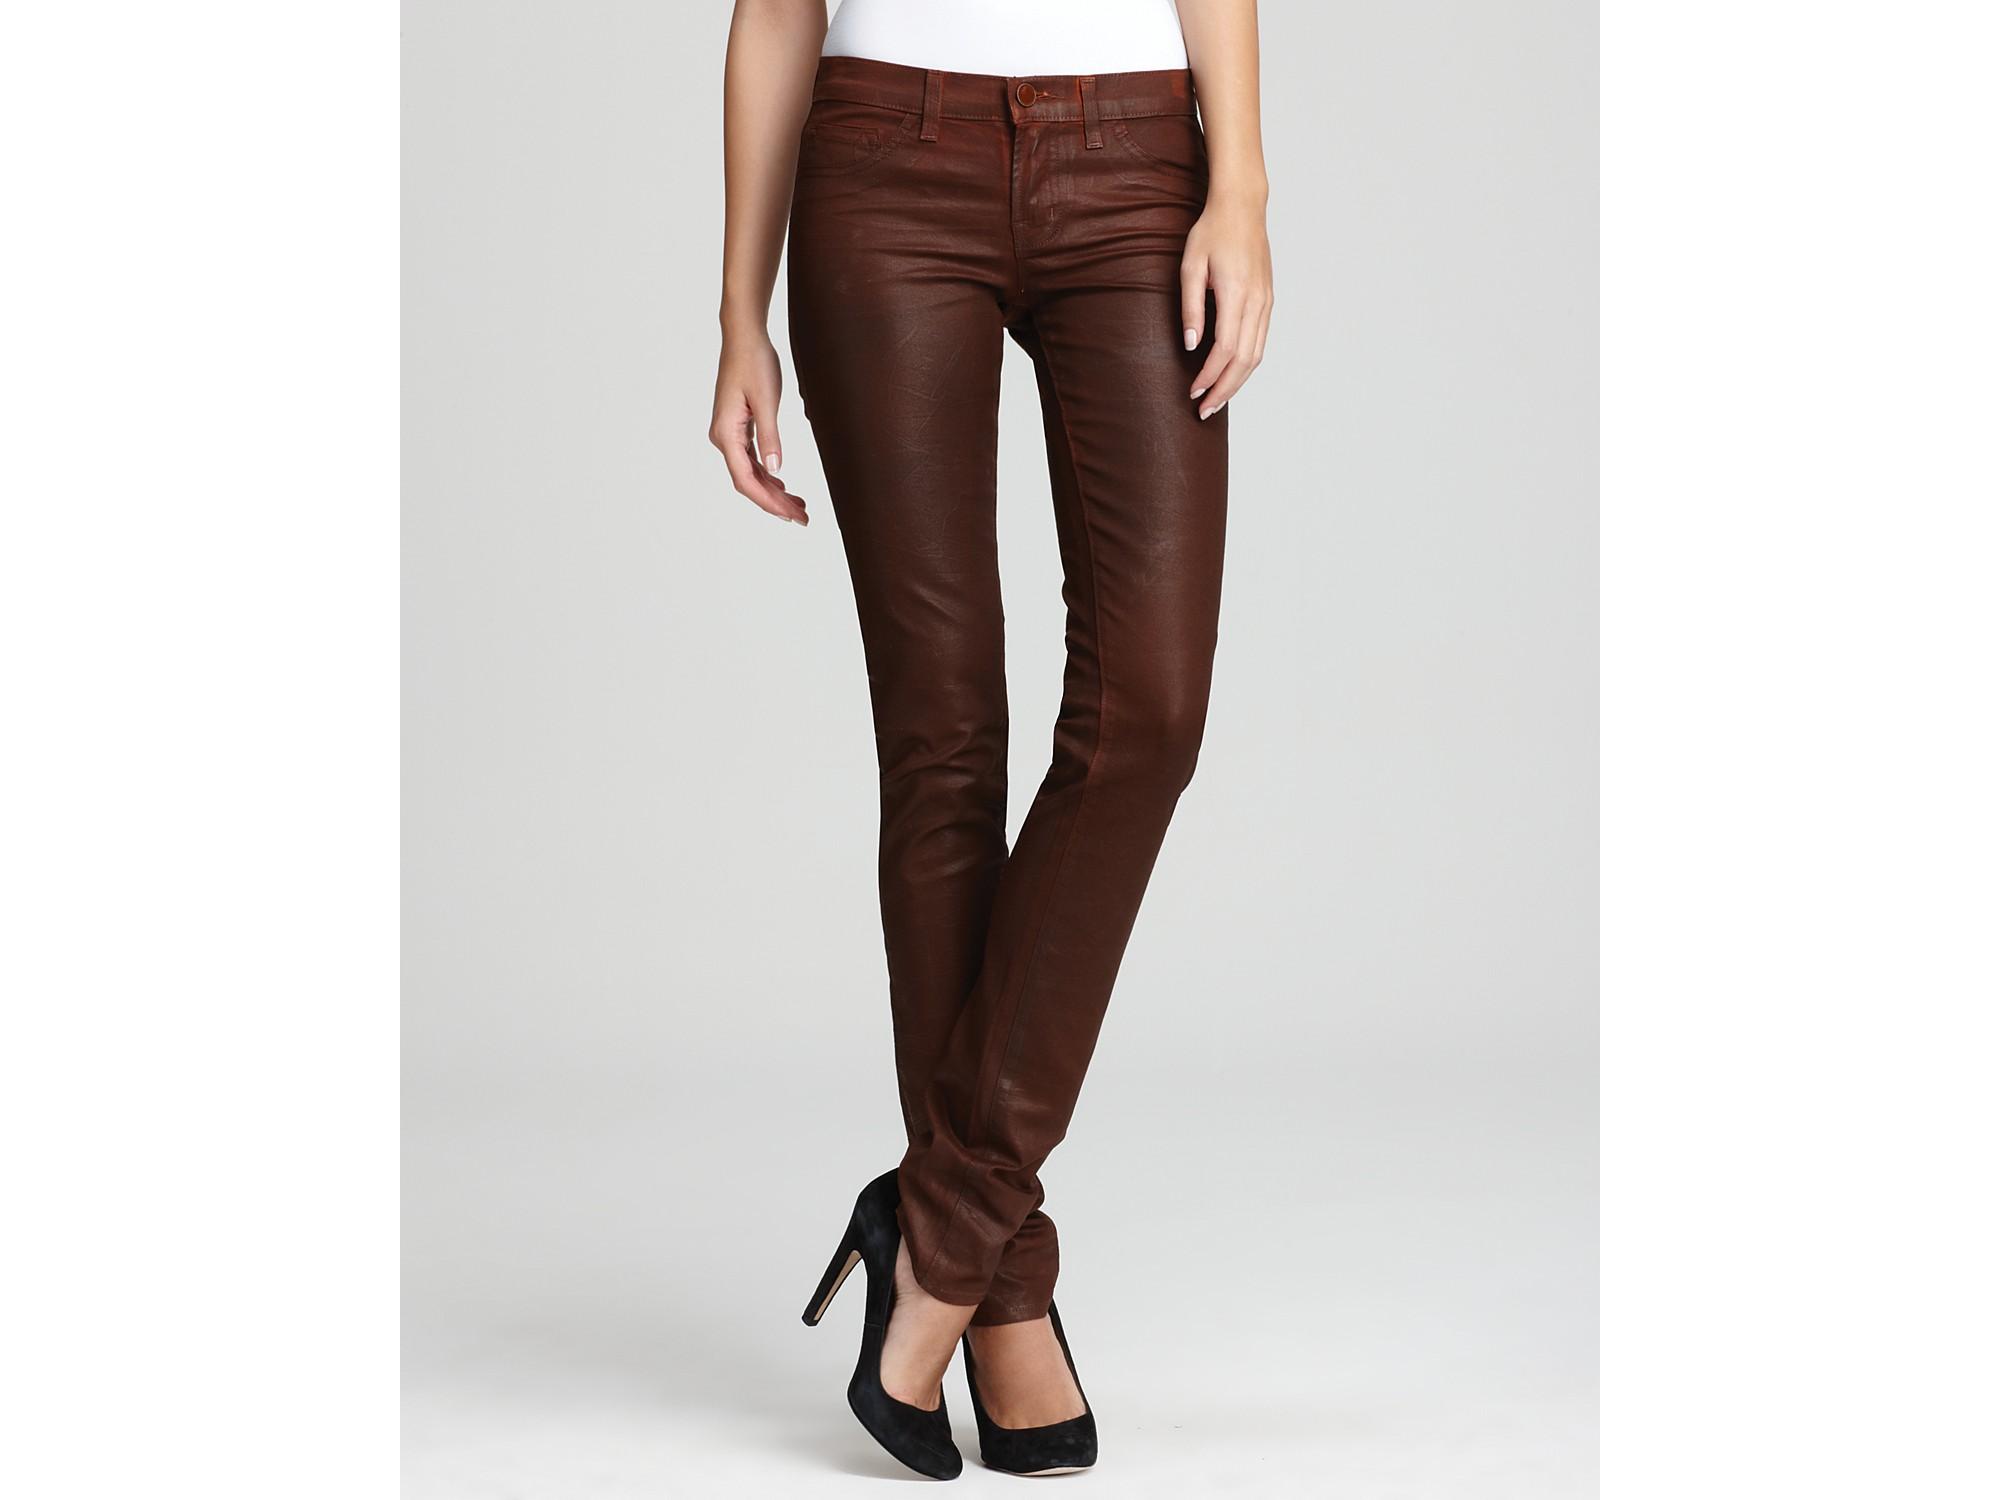 J brand brown skinny jeans